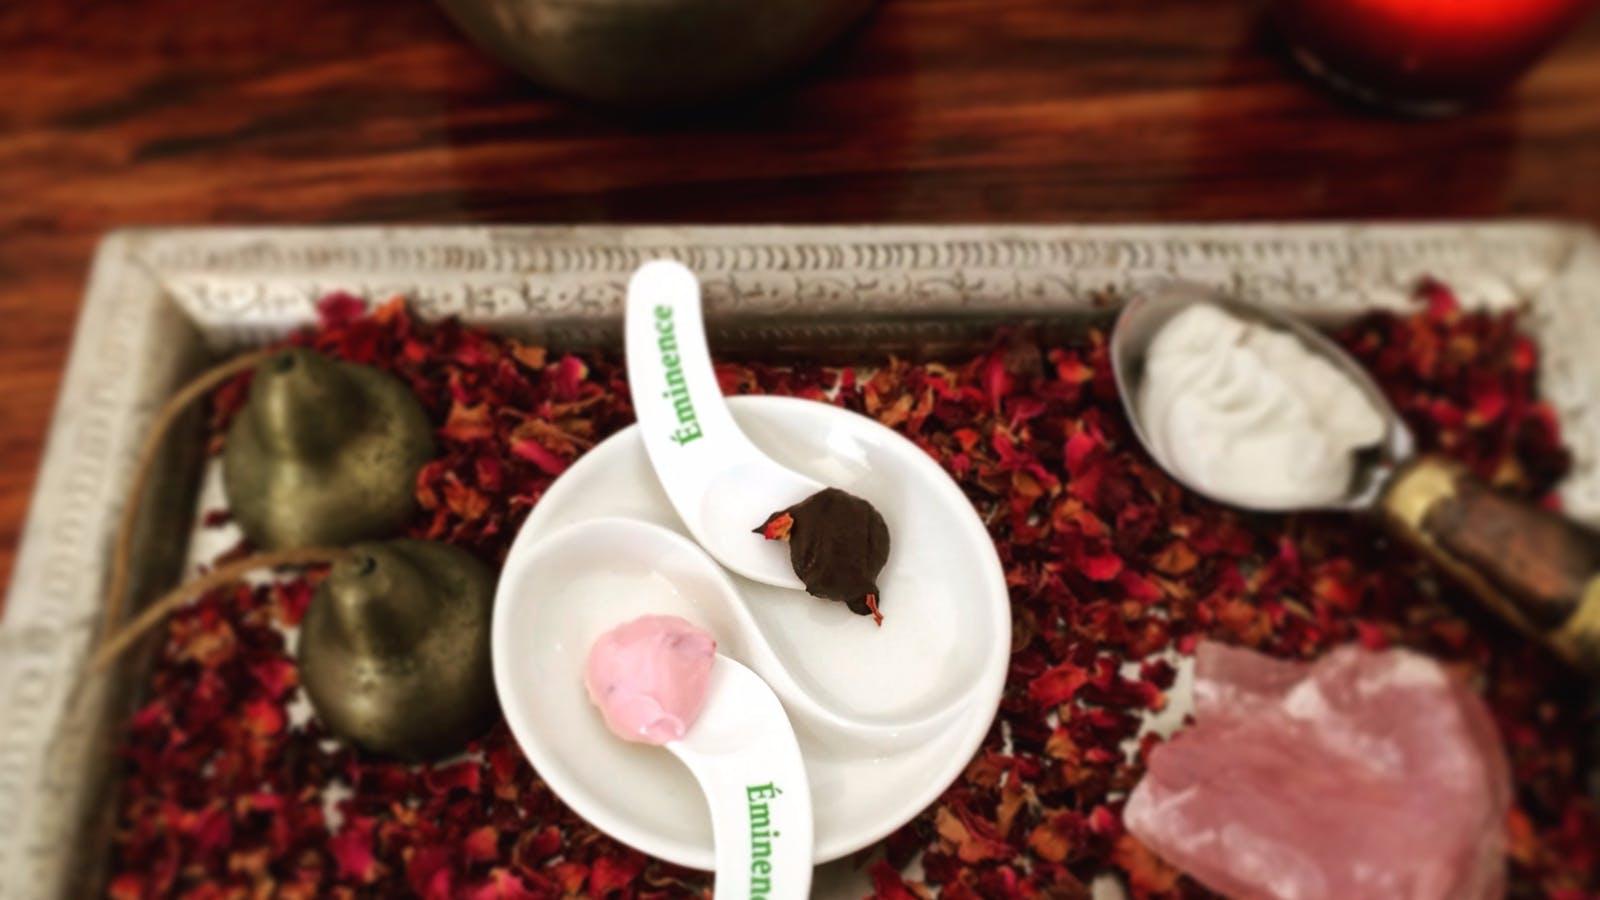 Finest Organic Products used - Eminence Organics